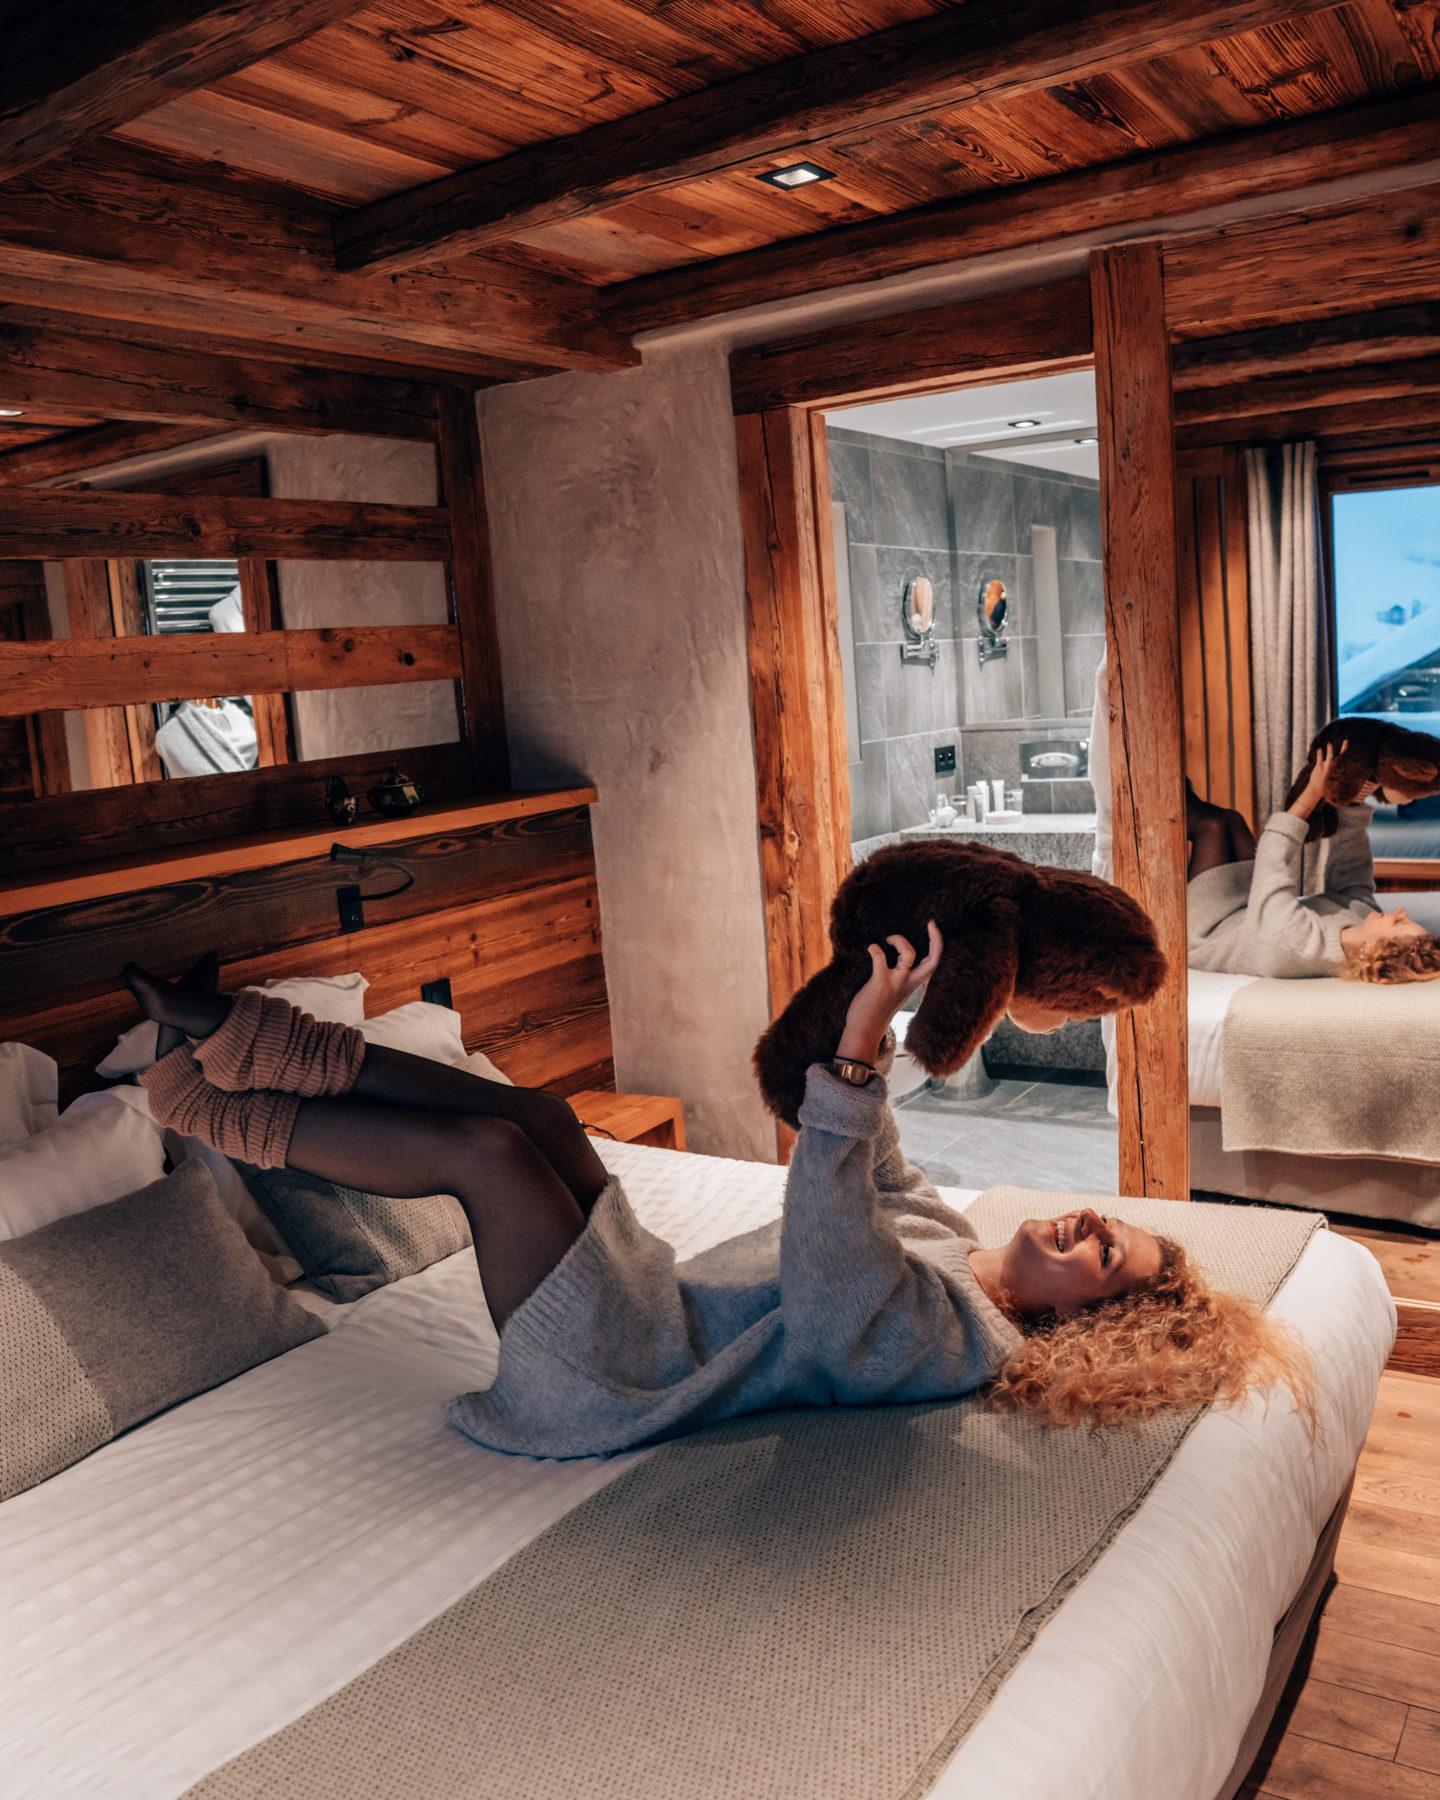 Cozy hotel room in Megeve